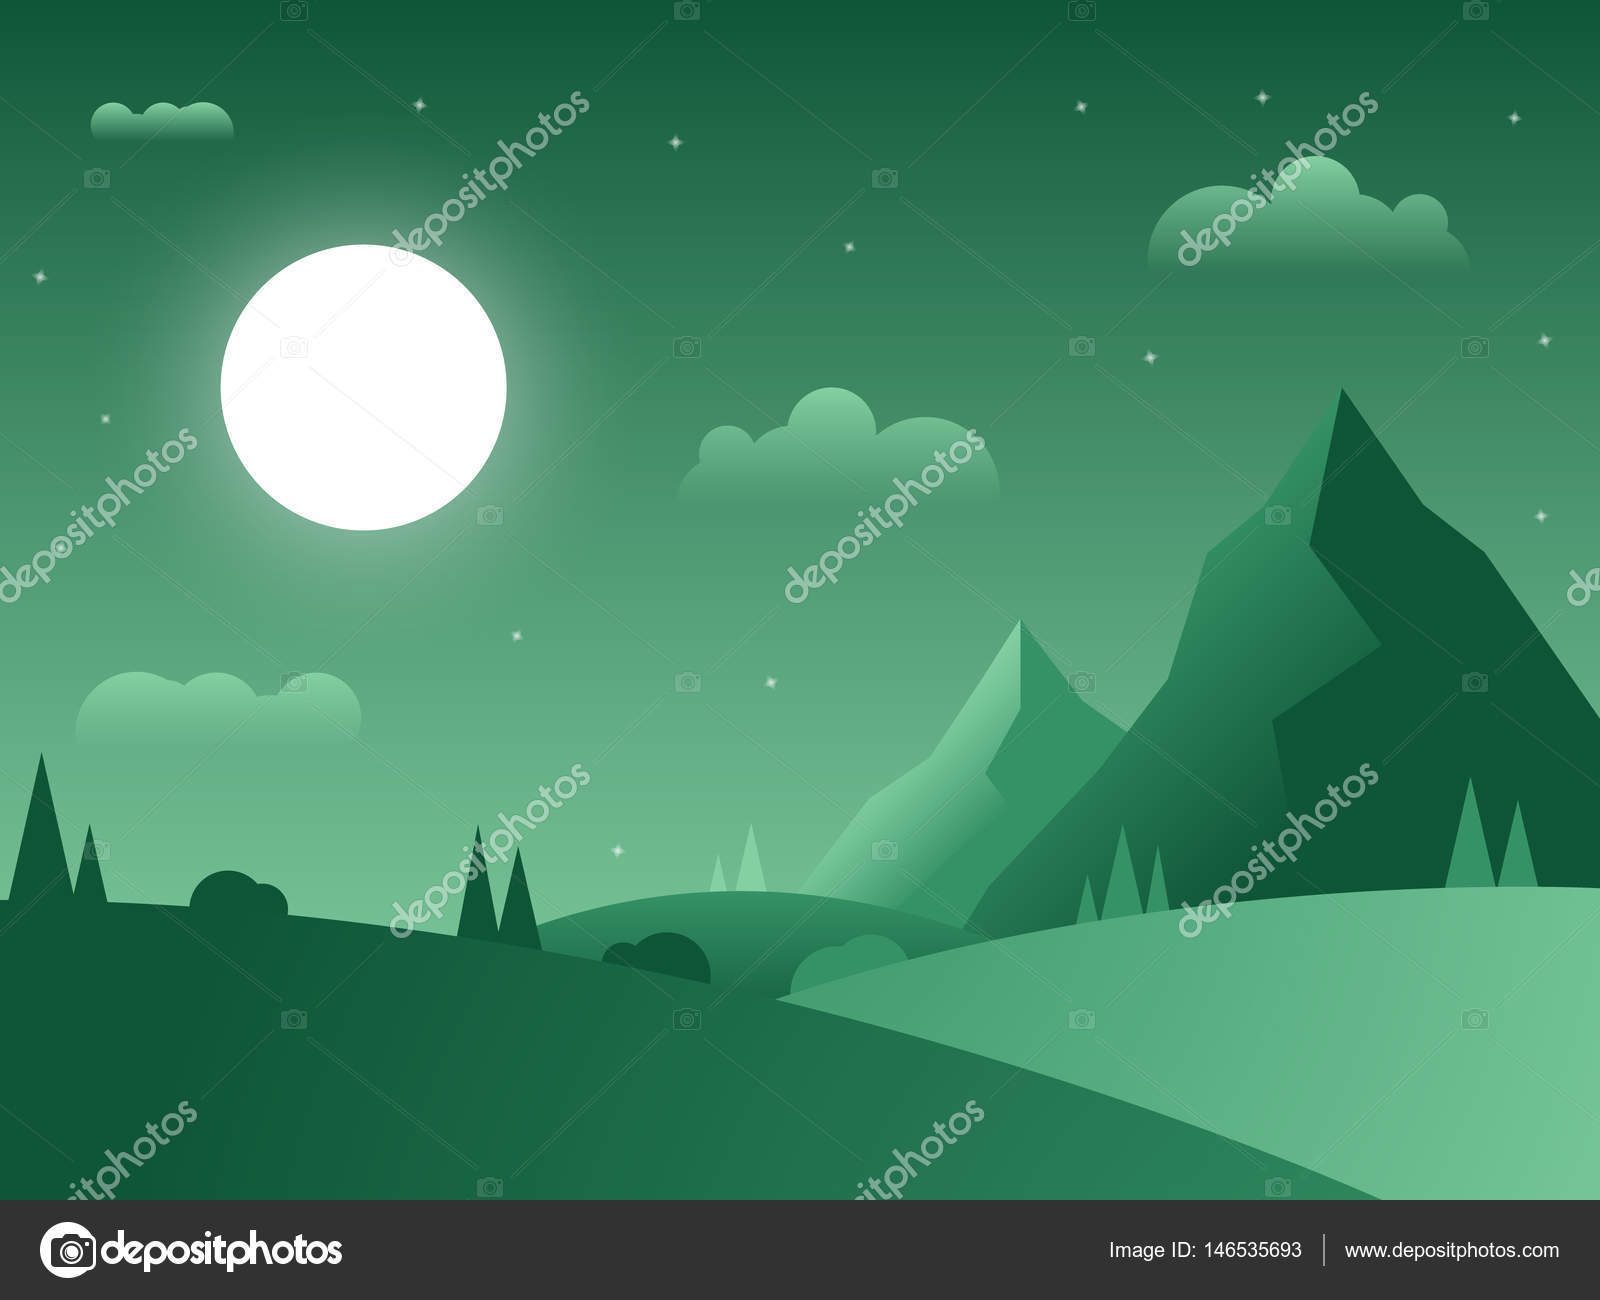 Great Wallpaper Night Grass - depositphotos_146535693-stock-illustration-night-flat-green-gradient-landscape  Collection-992765.jpg